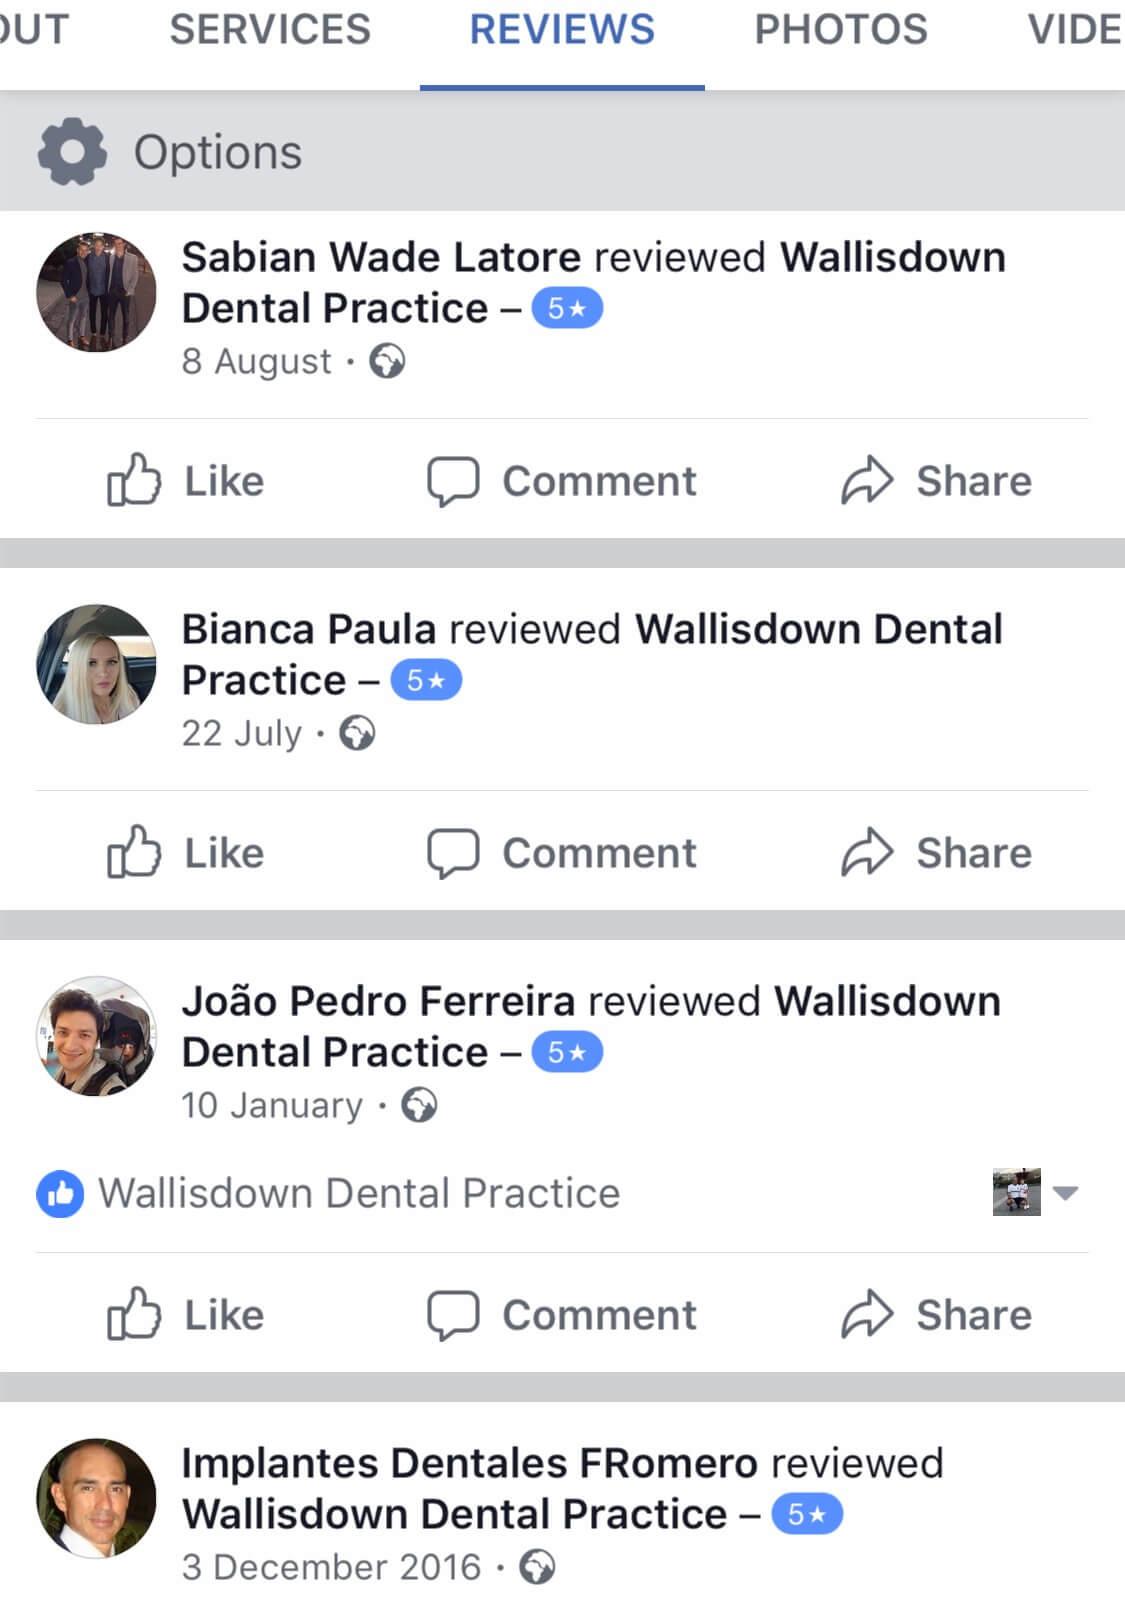 Wallisdown Dental Practice Reviews 4